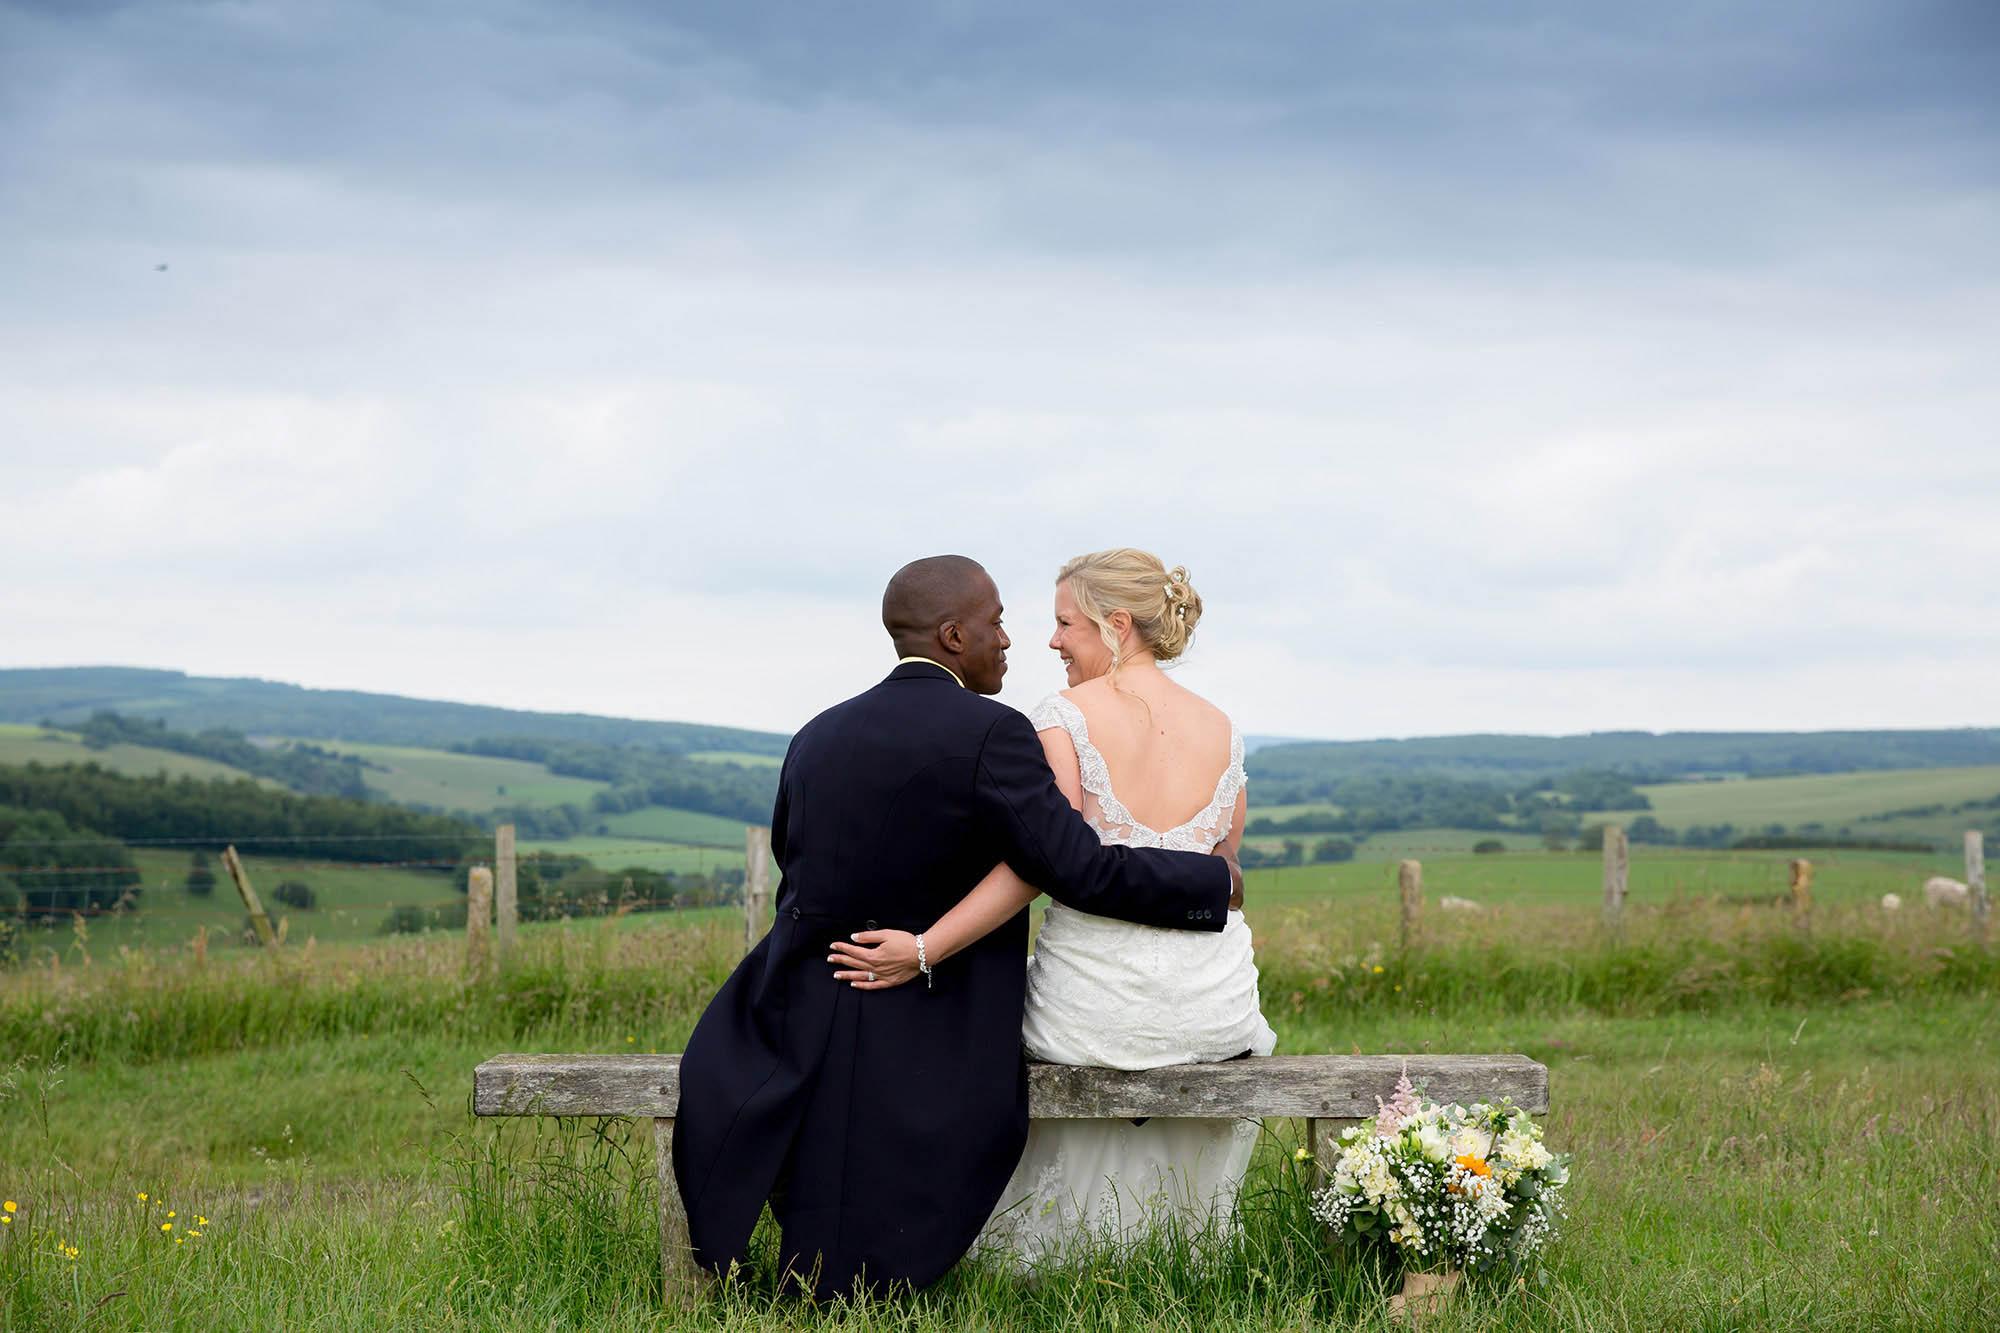 julia-toms-wedding-photographer-west-sussex-002.jpg